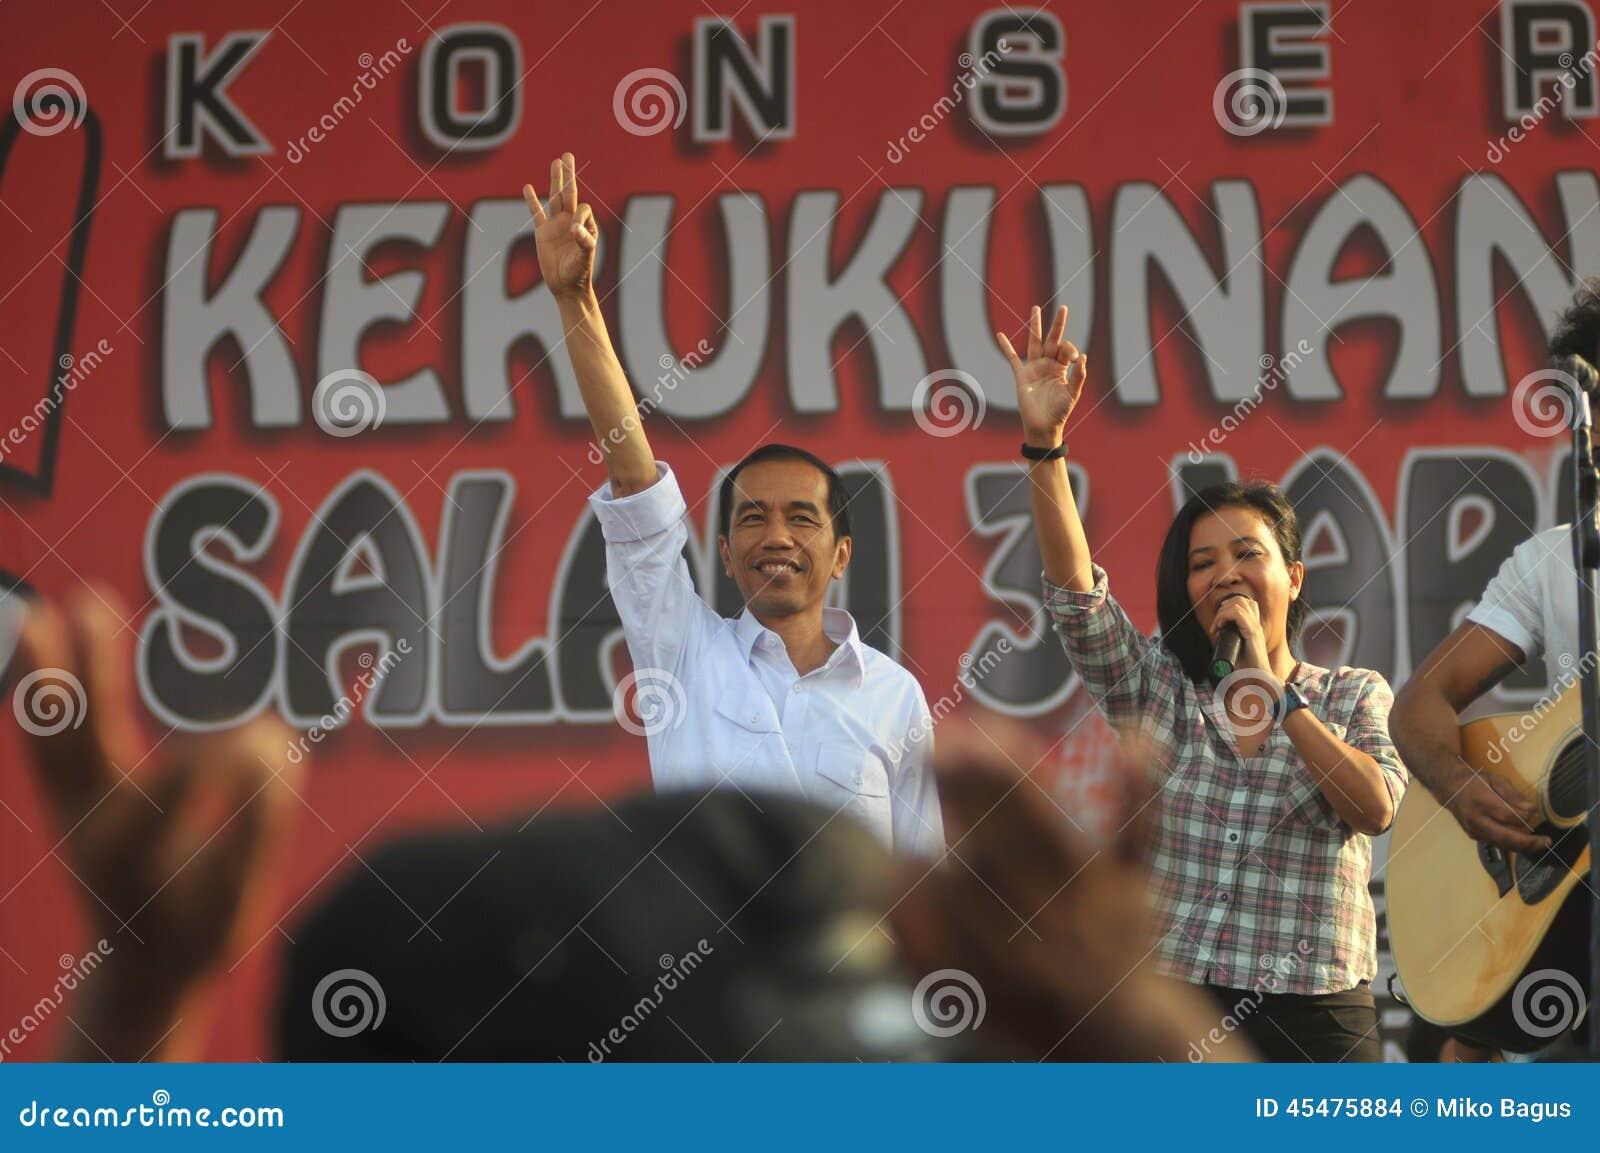 Indonesia Politics - A concert to celebrate The victory of Joko Widodo as presiden-elect